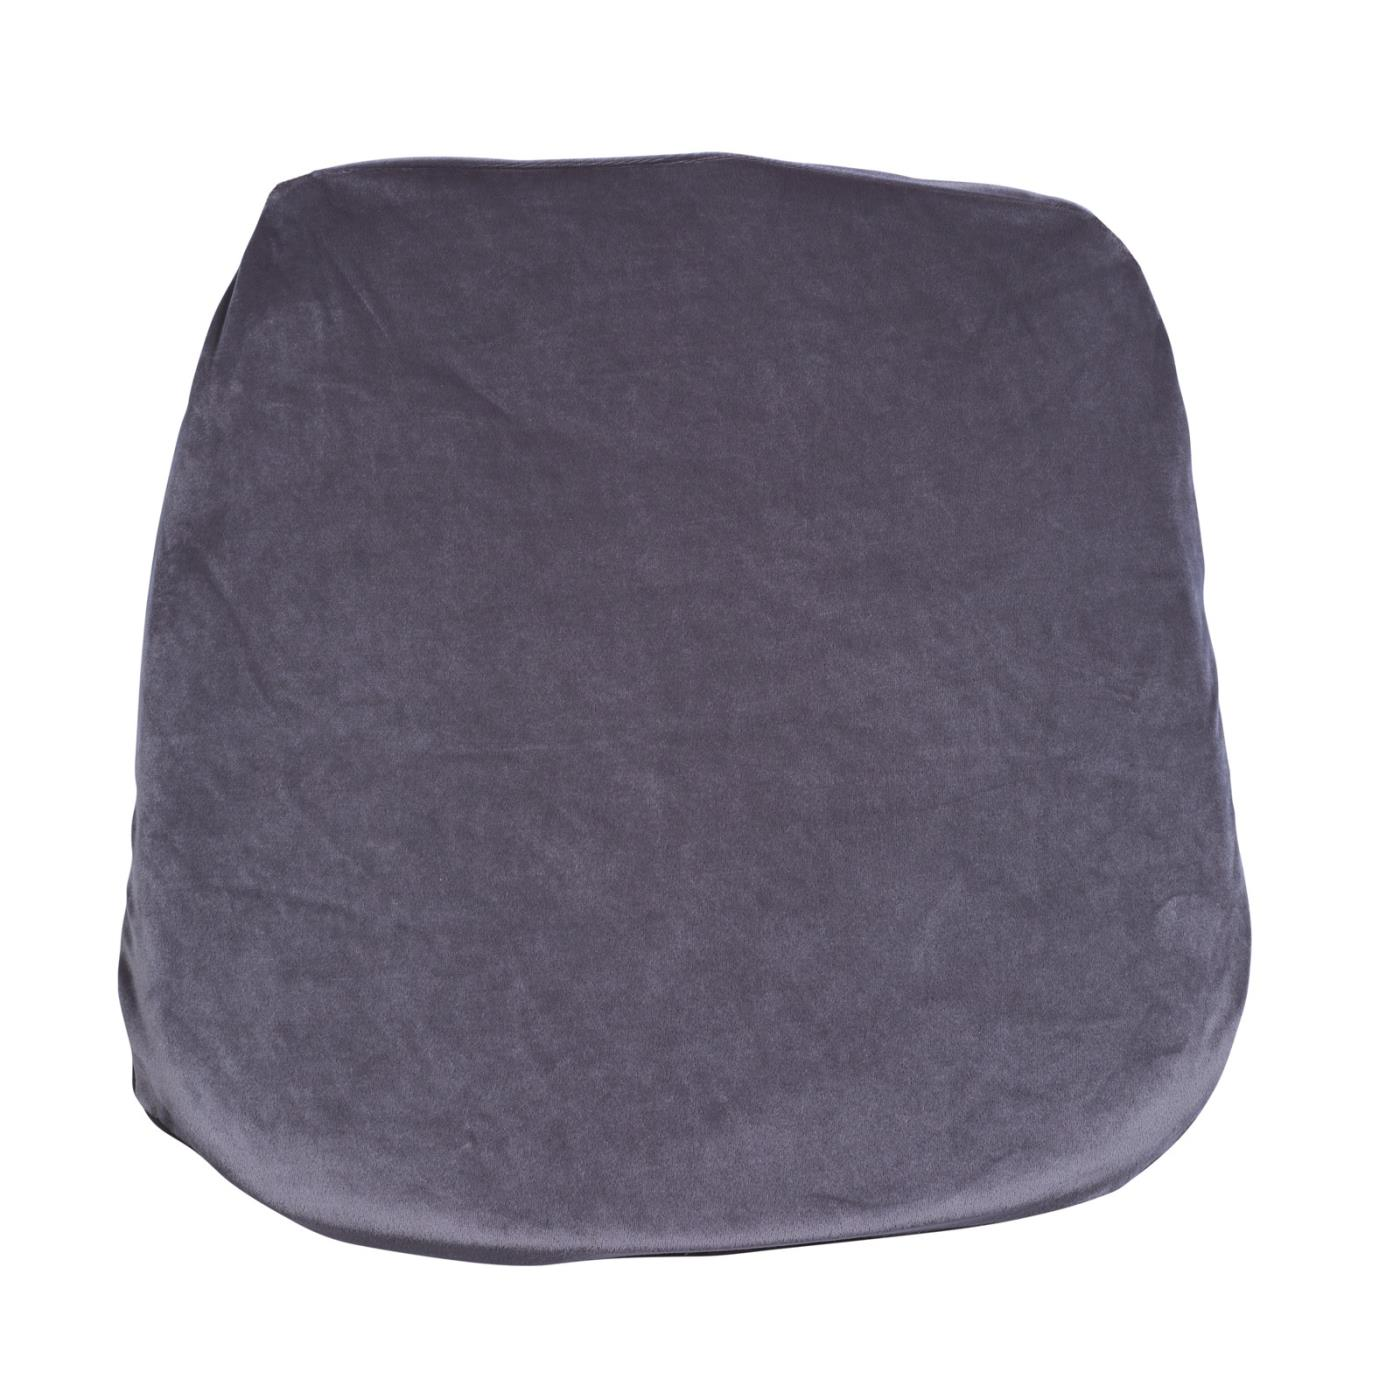 Velvet Seat Cushion - Steel Grey